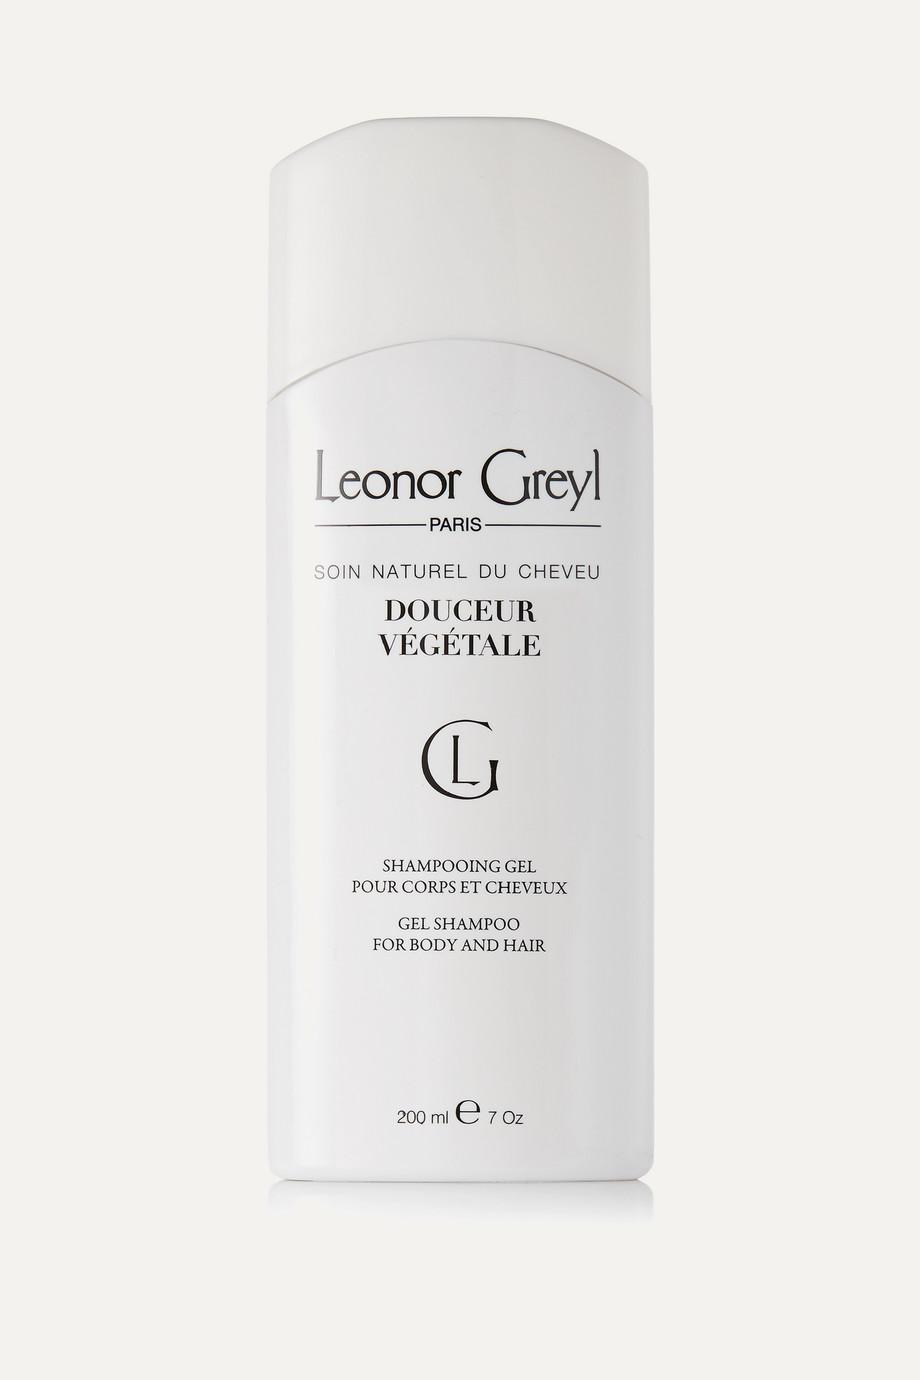 Leonor Greyl Paris Douceur Végétale Shampoo, 200 ml – Shampoo